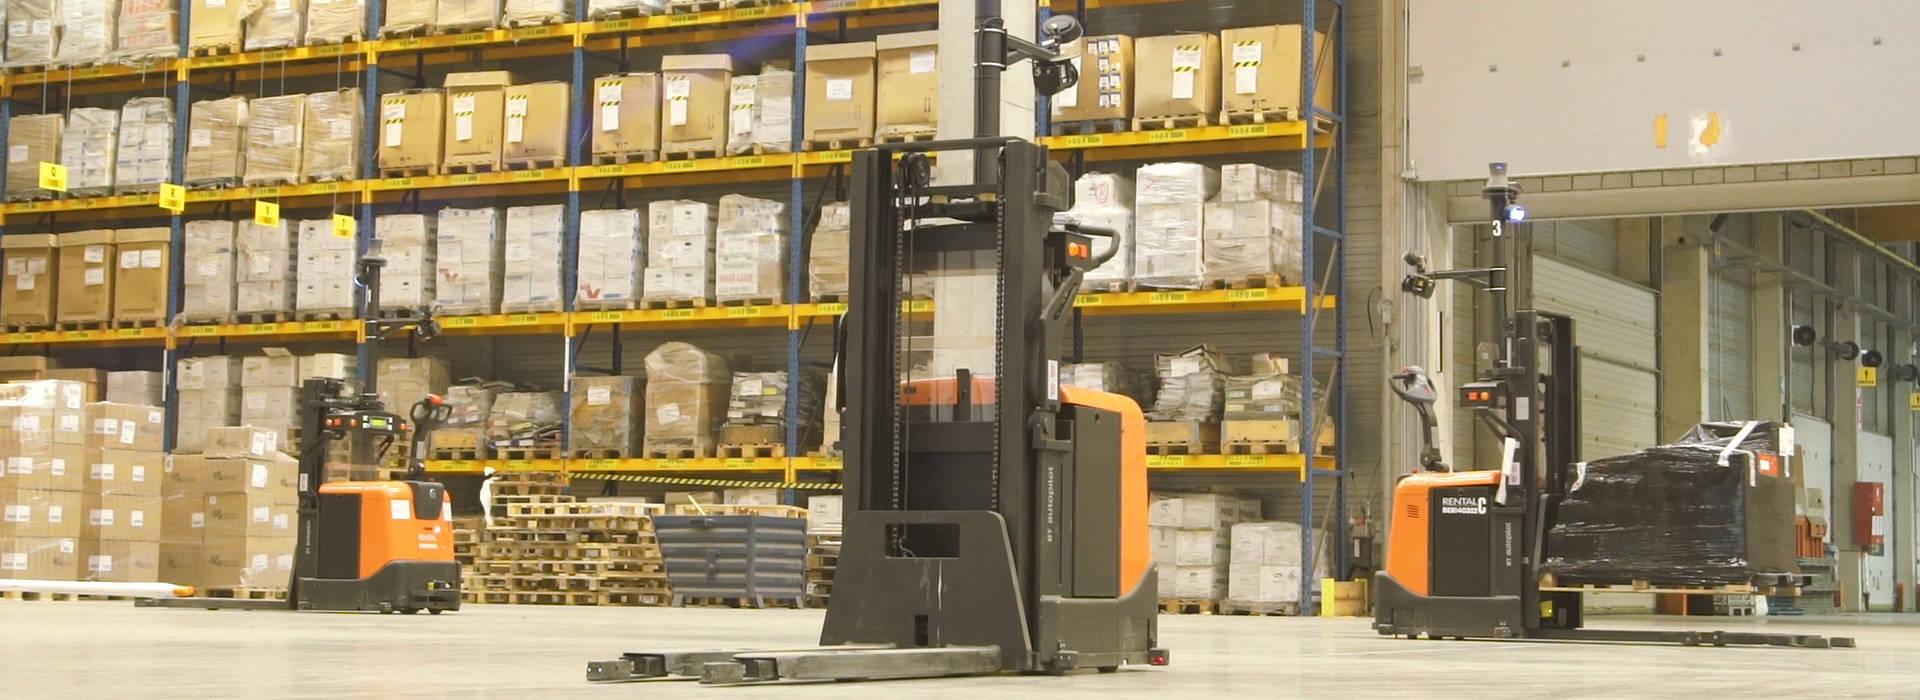 Automated trucks in DSV warehouse